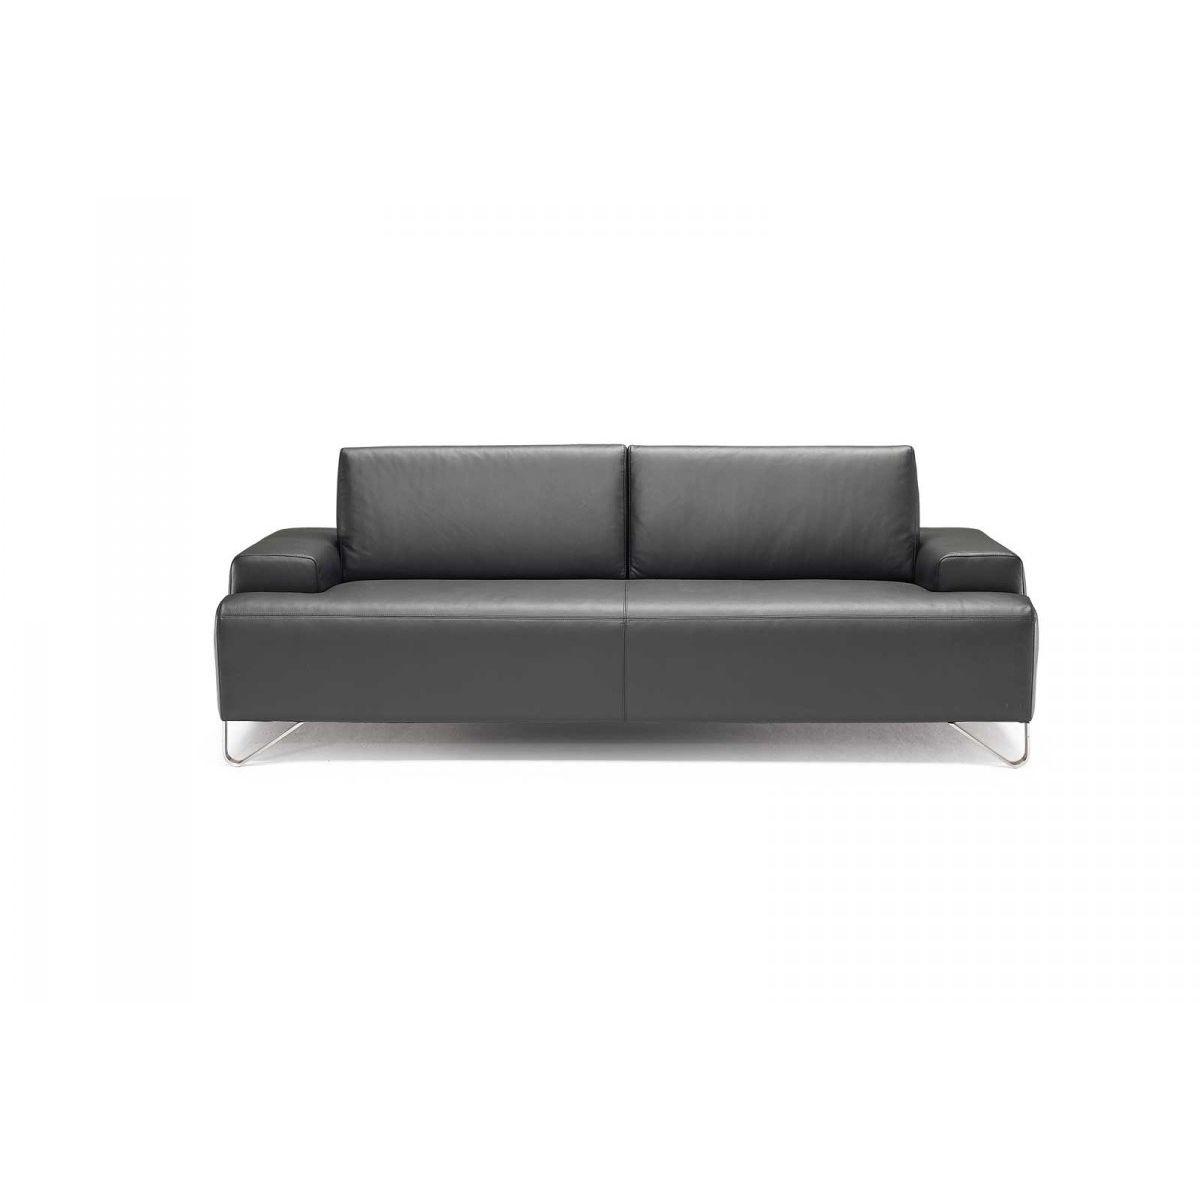 Modulierbares Sofa Modern Leder Stoff Fly Natuzzi